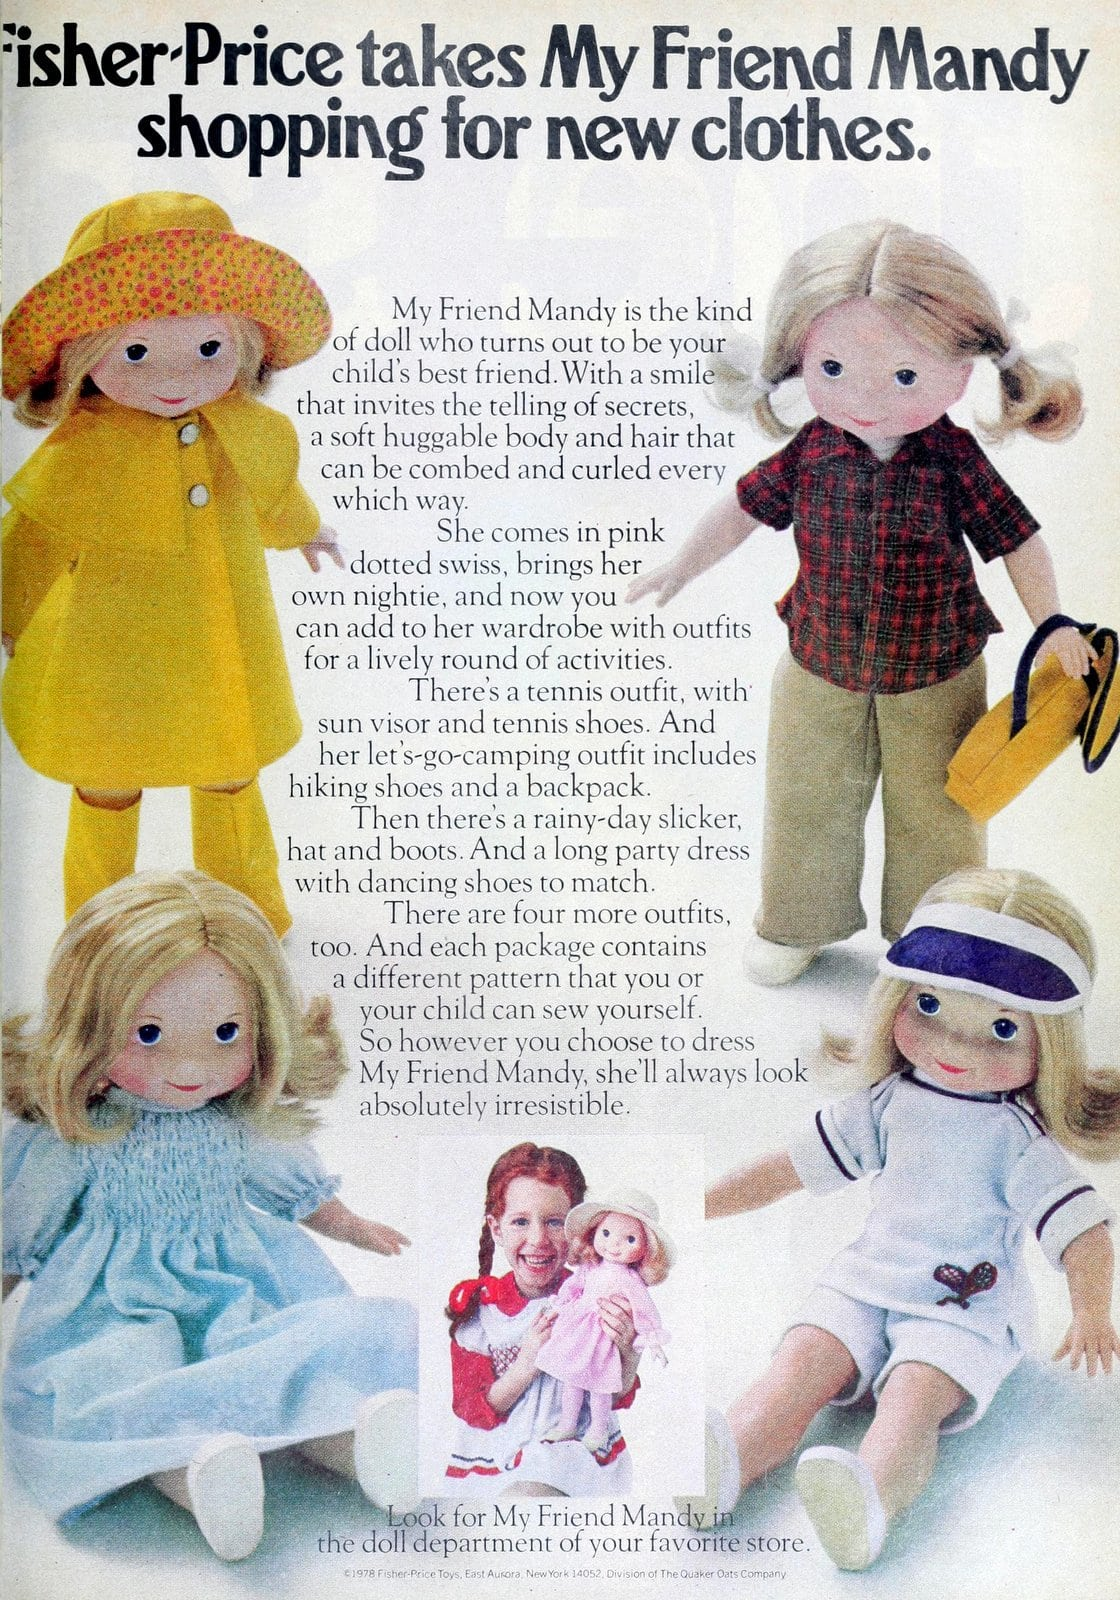 Fisher-Price My Friend Mandy dress-up doll (1980)